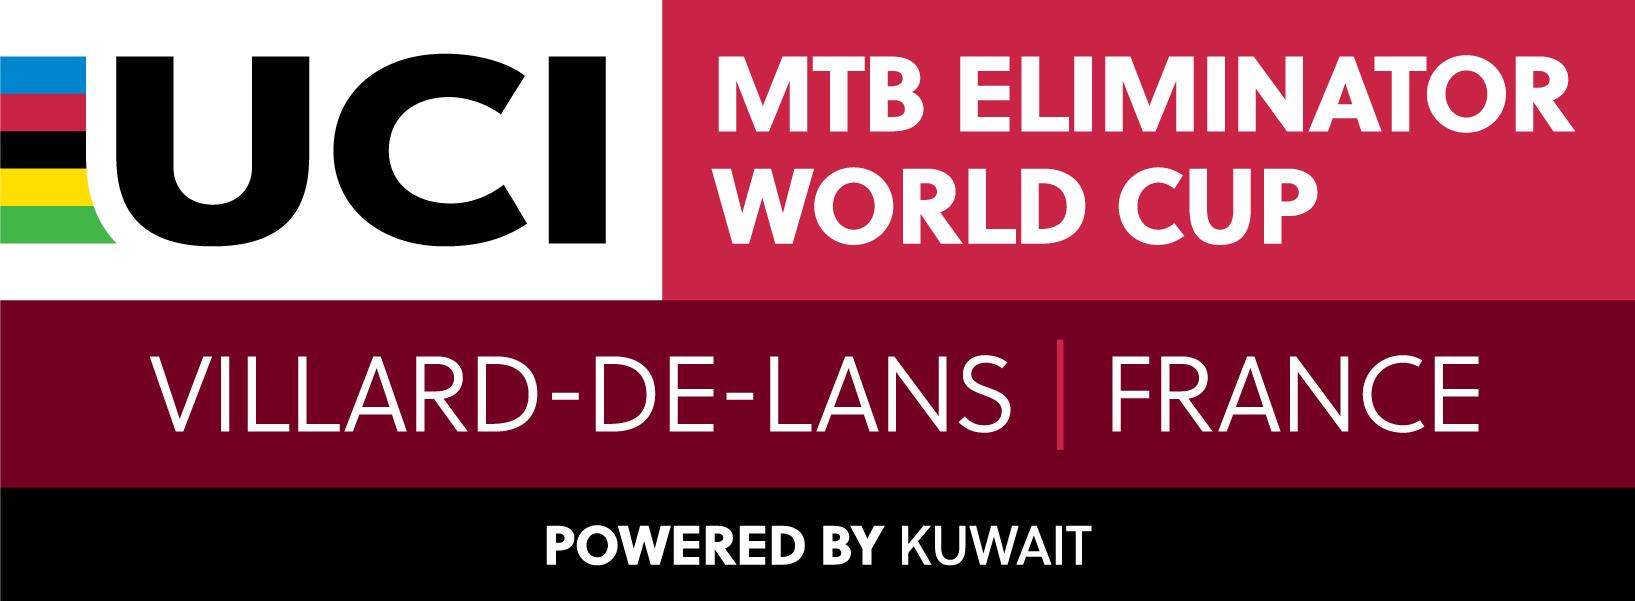 2020 UCI MTB XCE WCup Villard De Lans France CMYK Stacked Outline